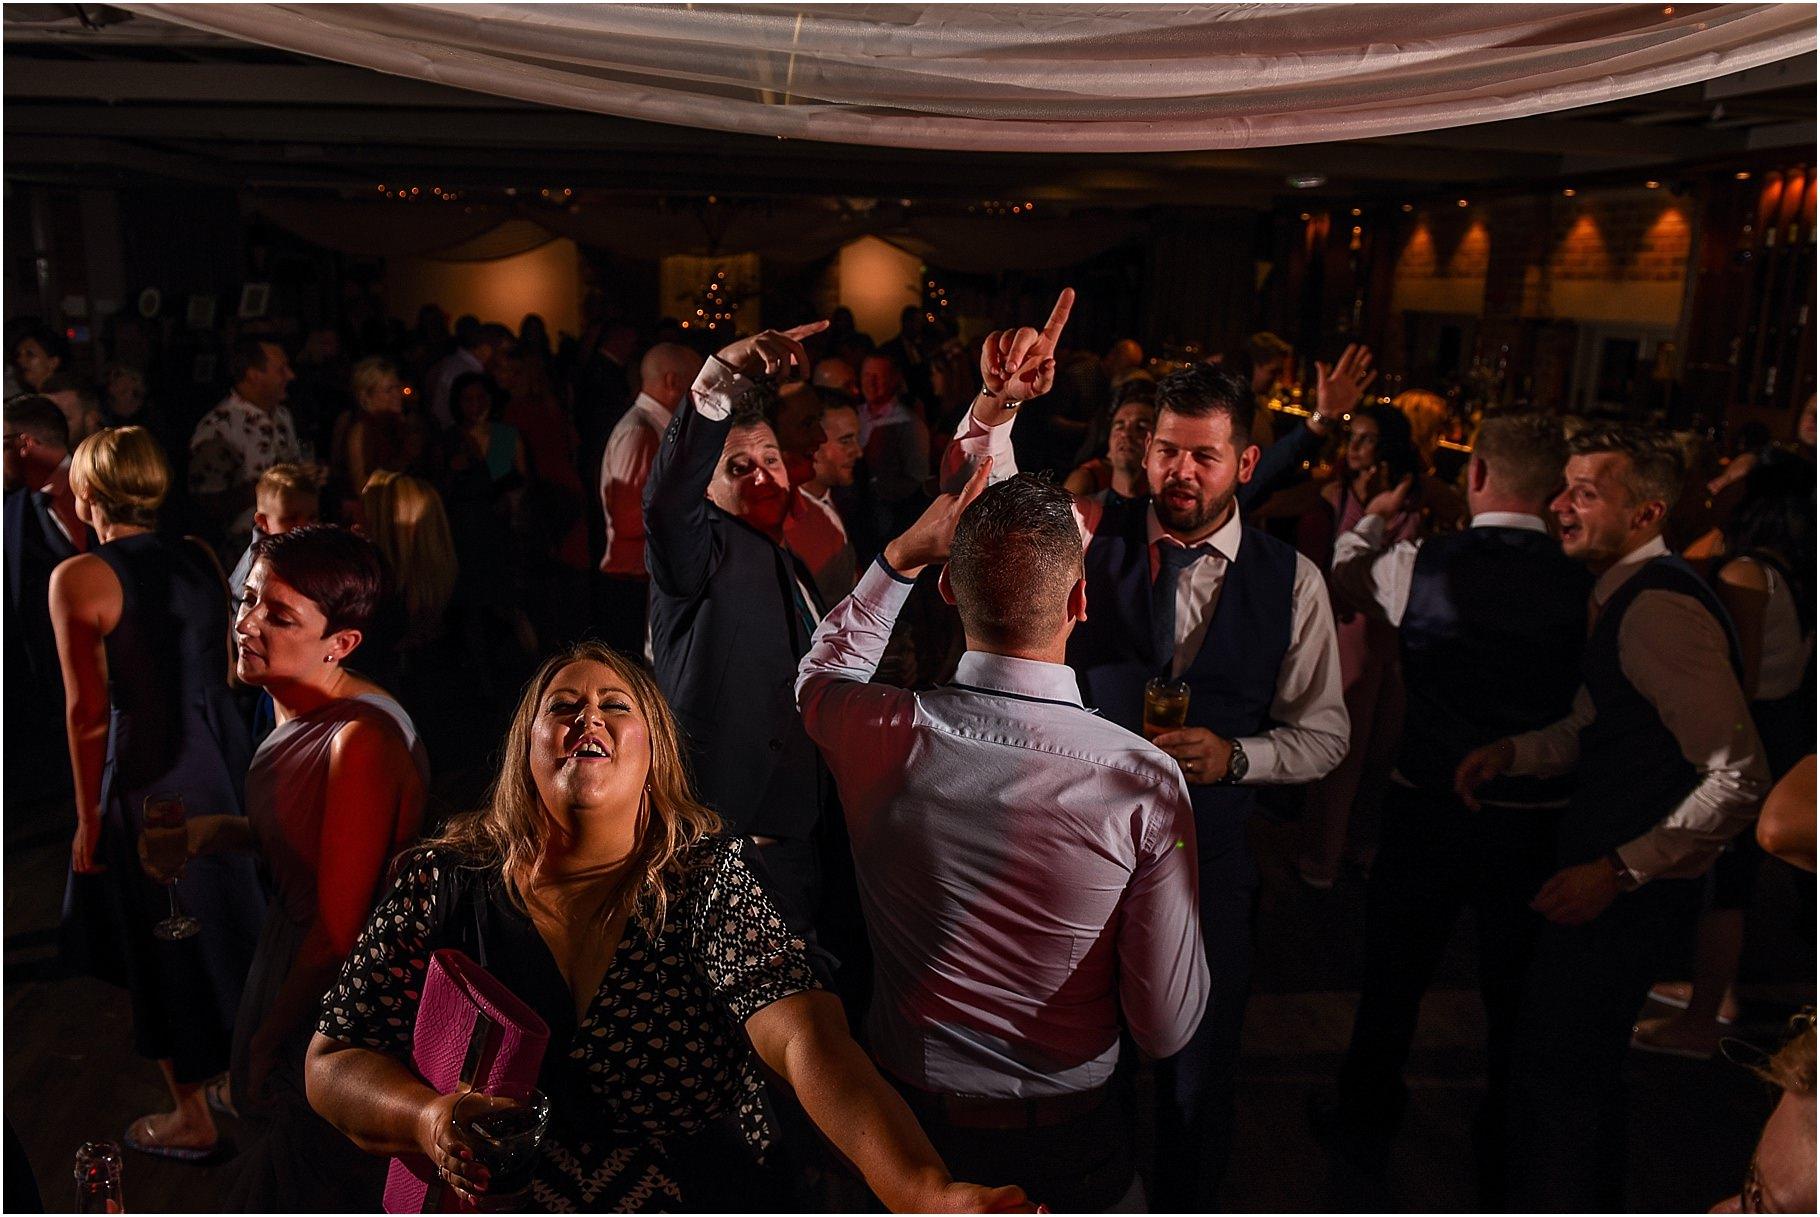 bartle-hall-wedding-photography-104.jpg